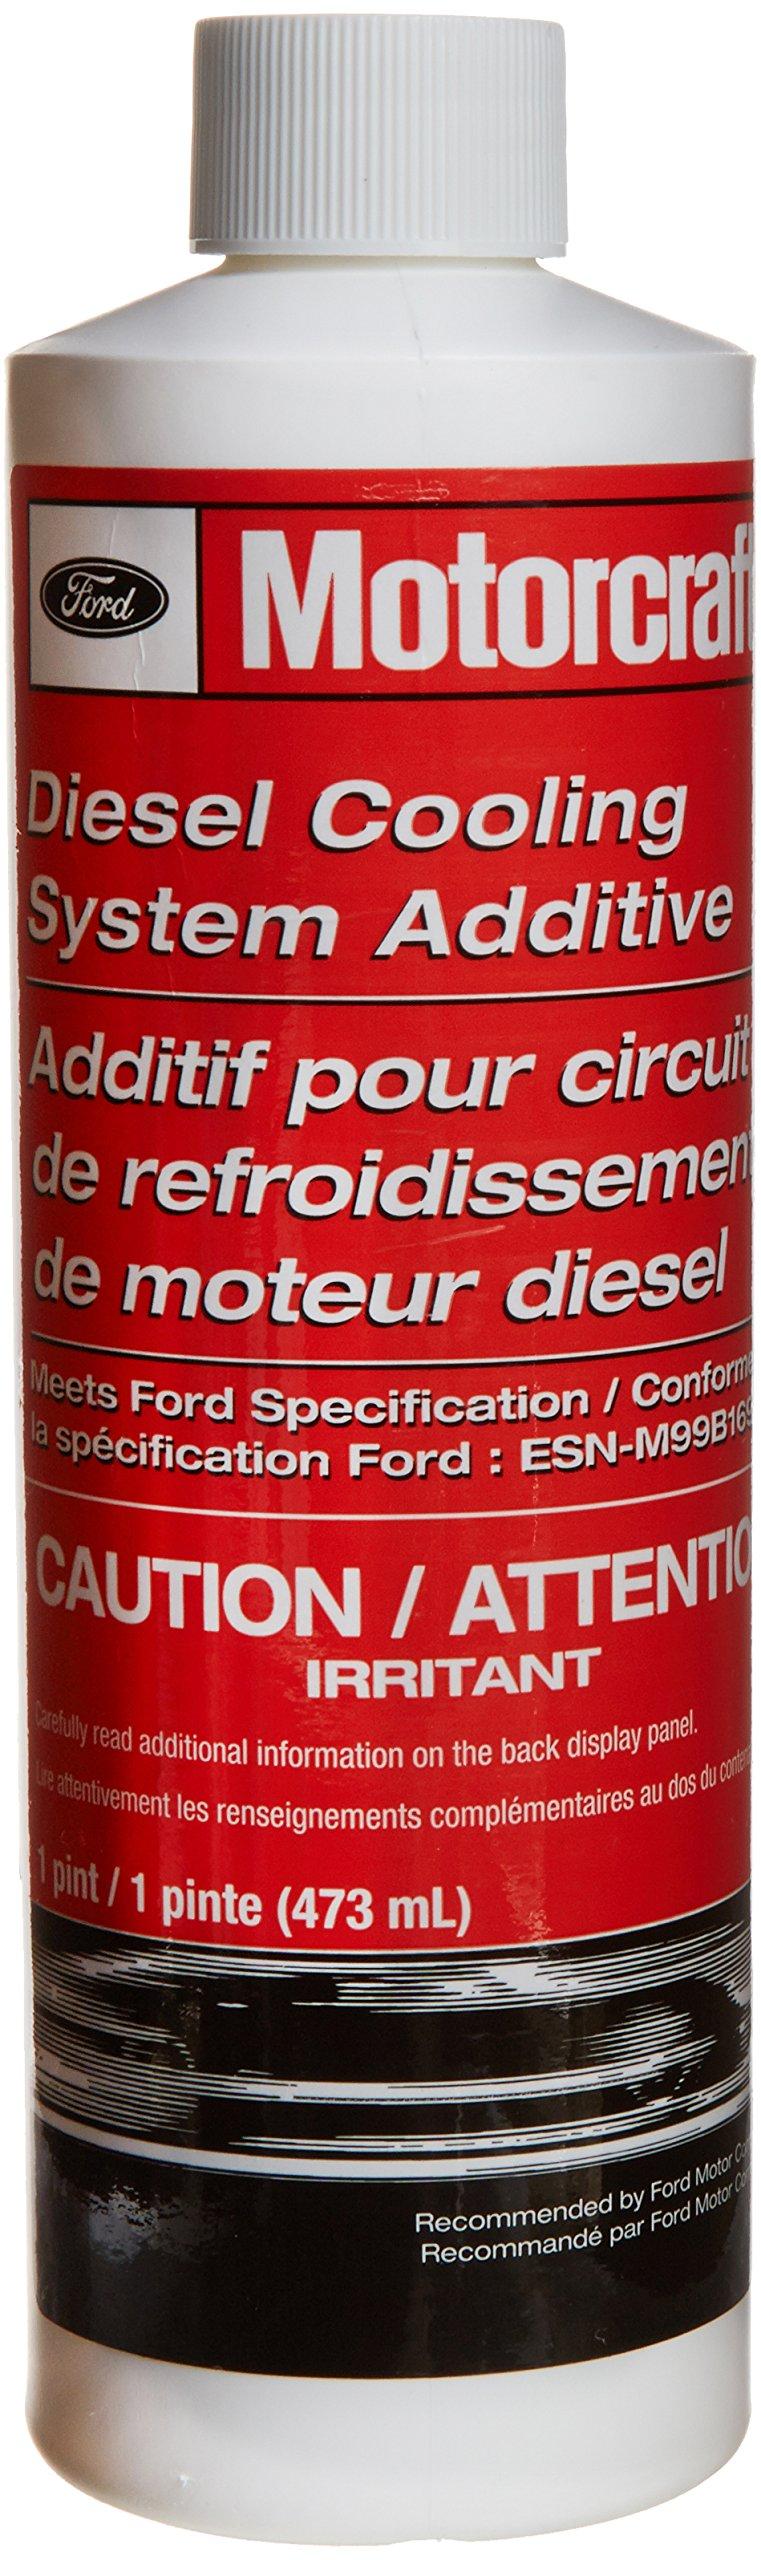 Genuine Ford Fluid VC-8 Diesel Cooling System Additive - 16 oz.